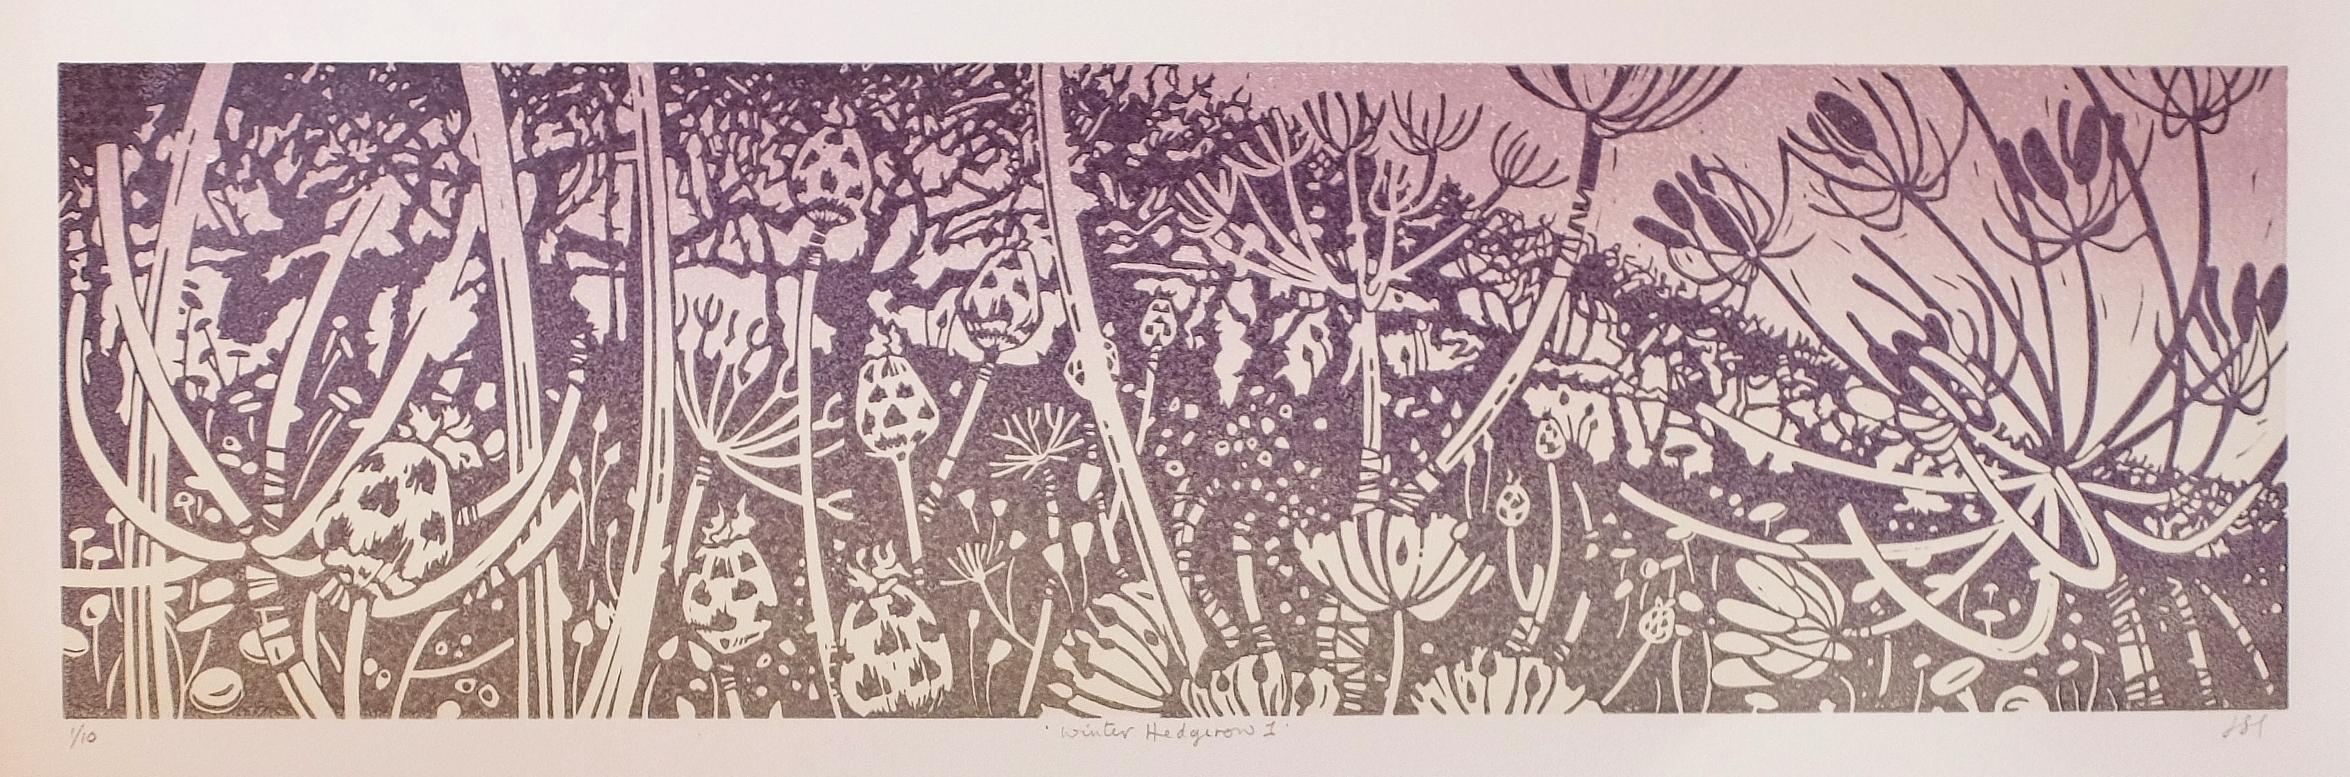 Winter Hedgerow 2, 140mm x 480mm, Unmounted, £120.00